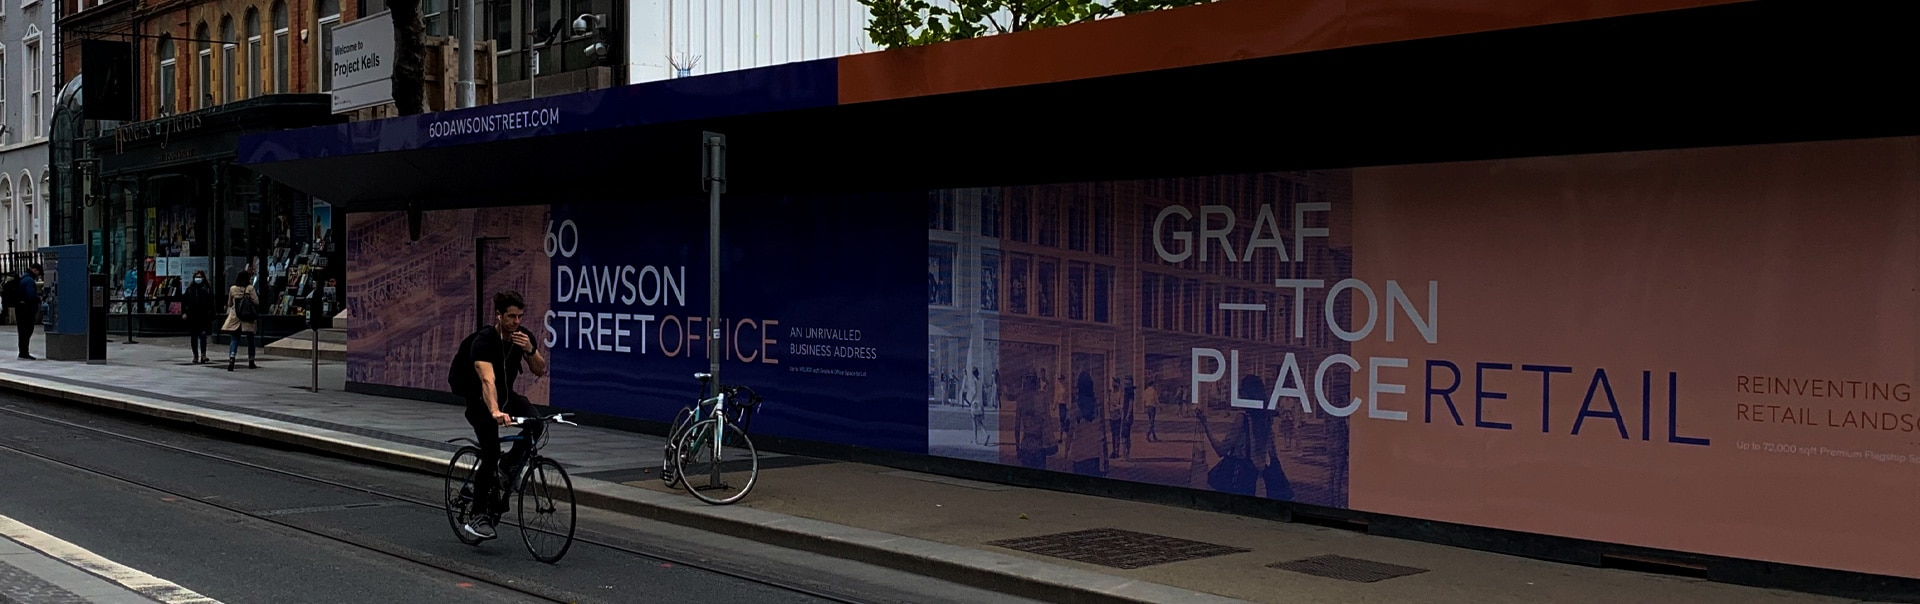 Placemaking hoarding at Grafton Place / 60 Dawson Street